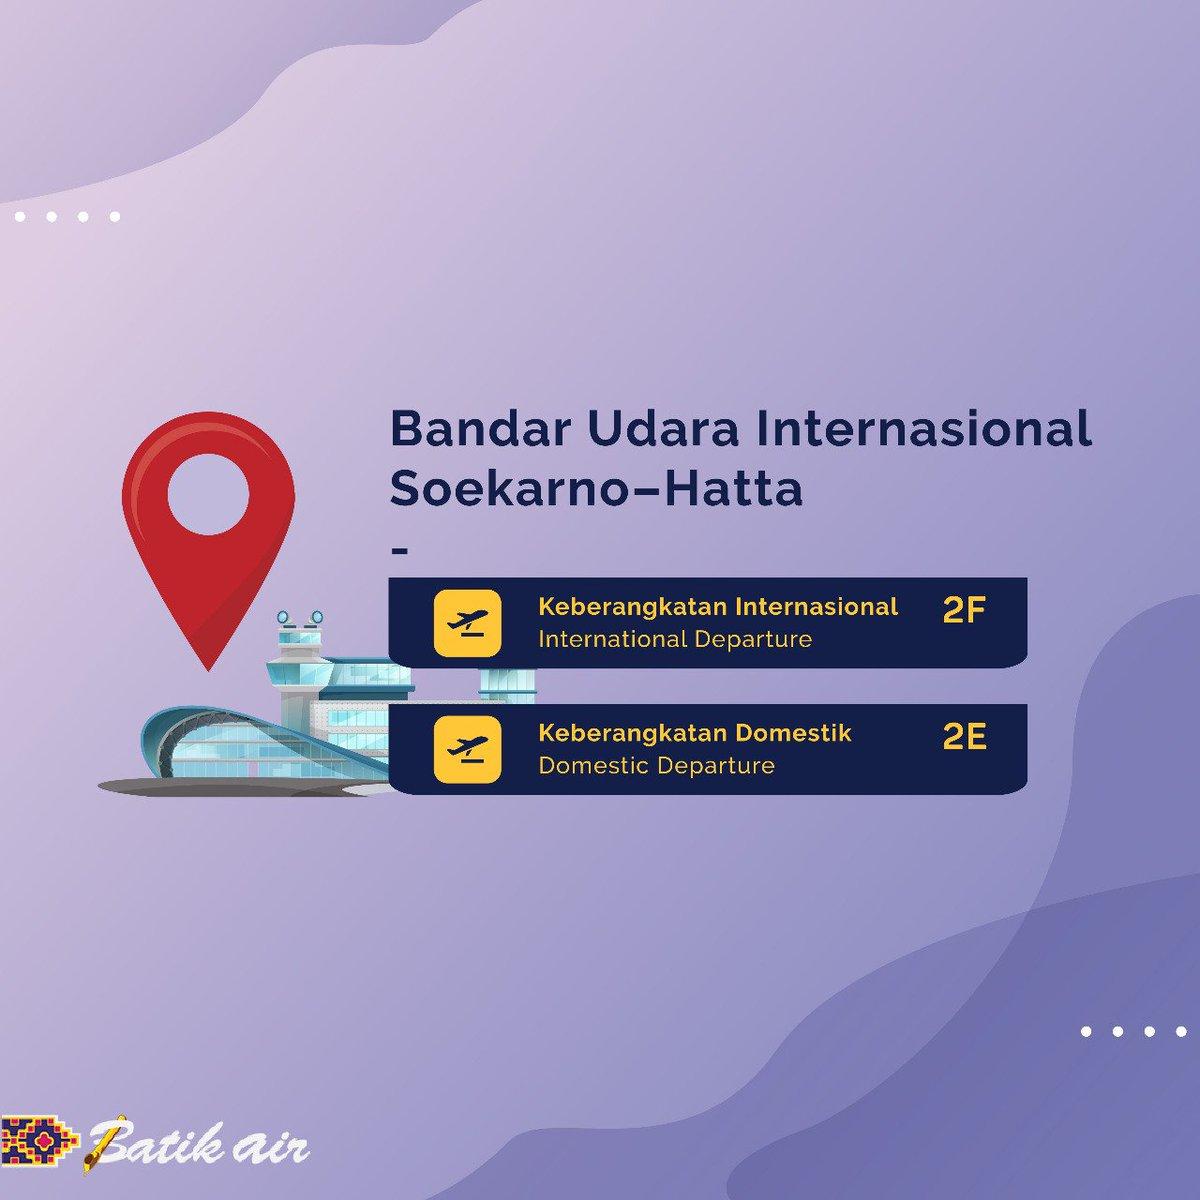 EA21p79VAAAnKmn - Jenis Font Boarding Pass Lion Air